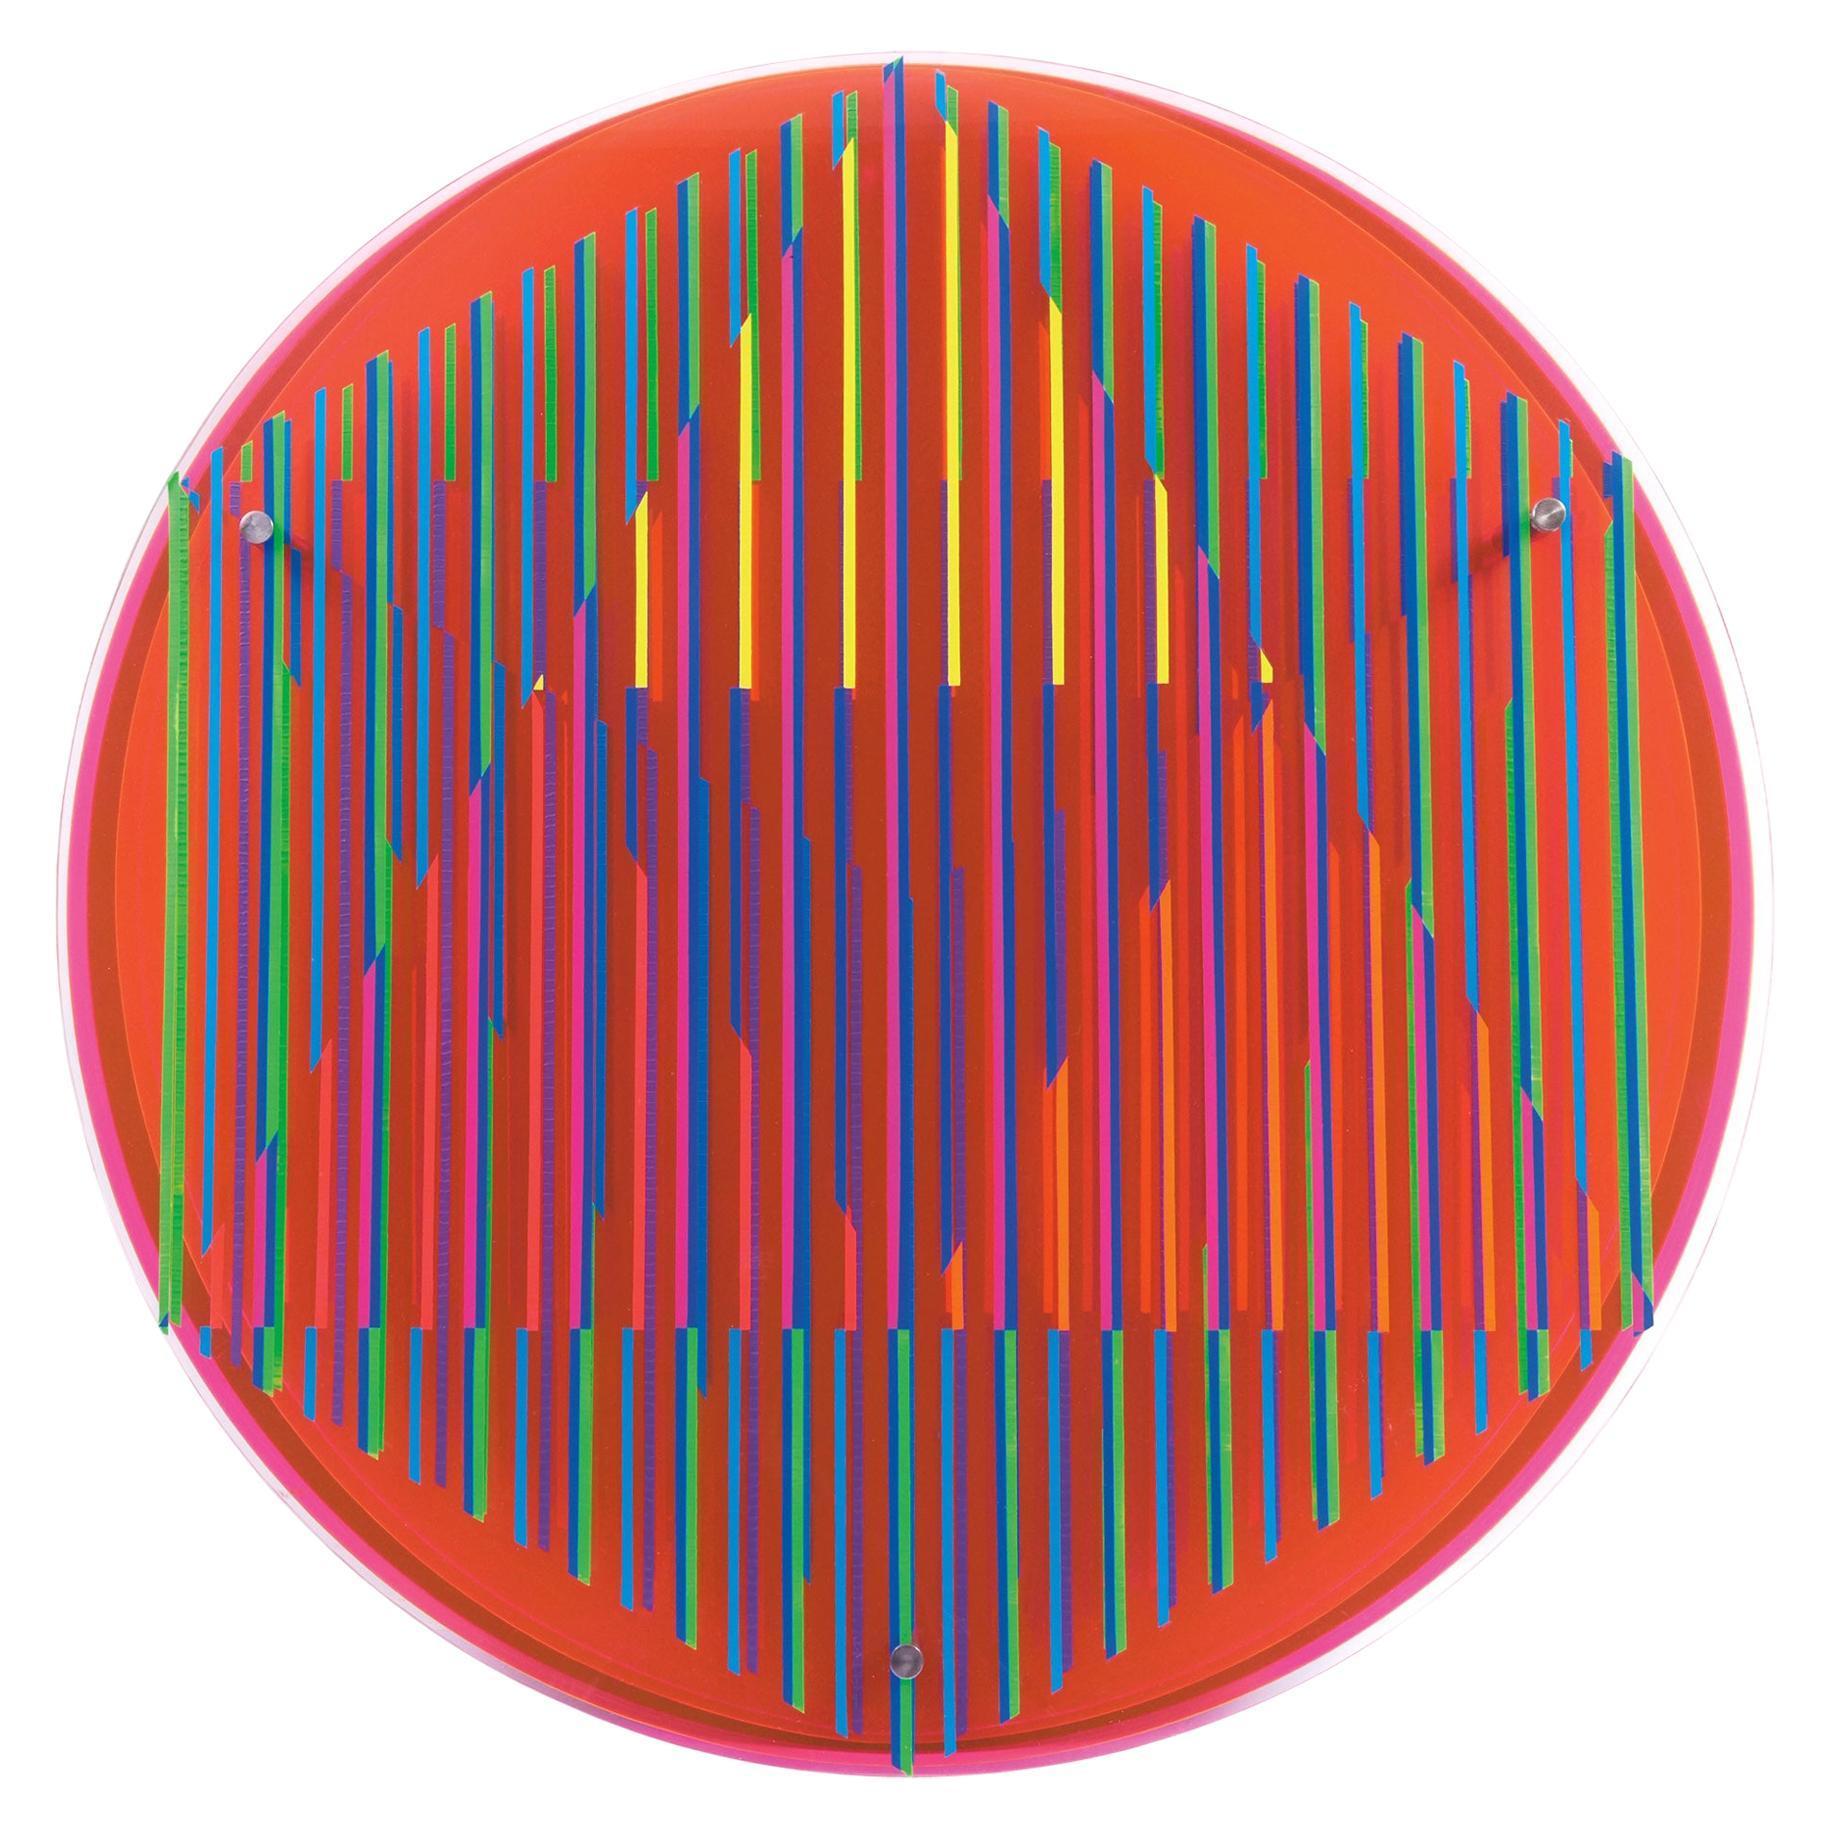 Geometría Sagrada / Lao Gabrielli / Artist